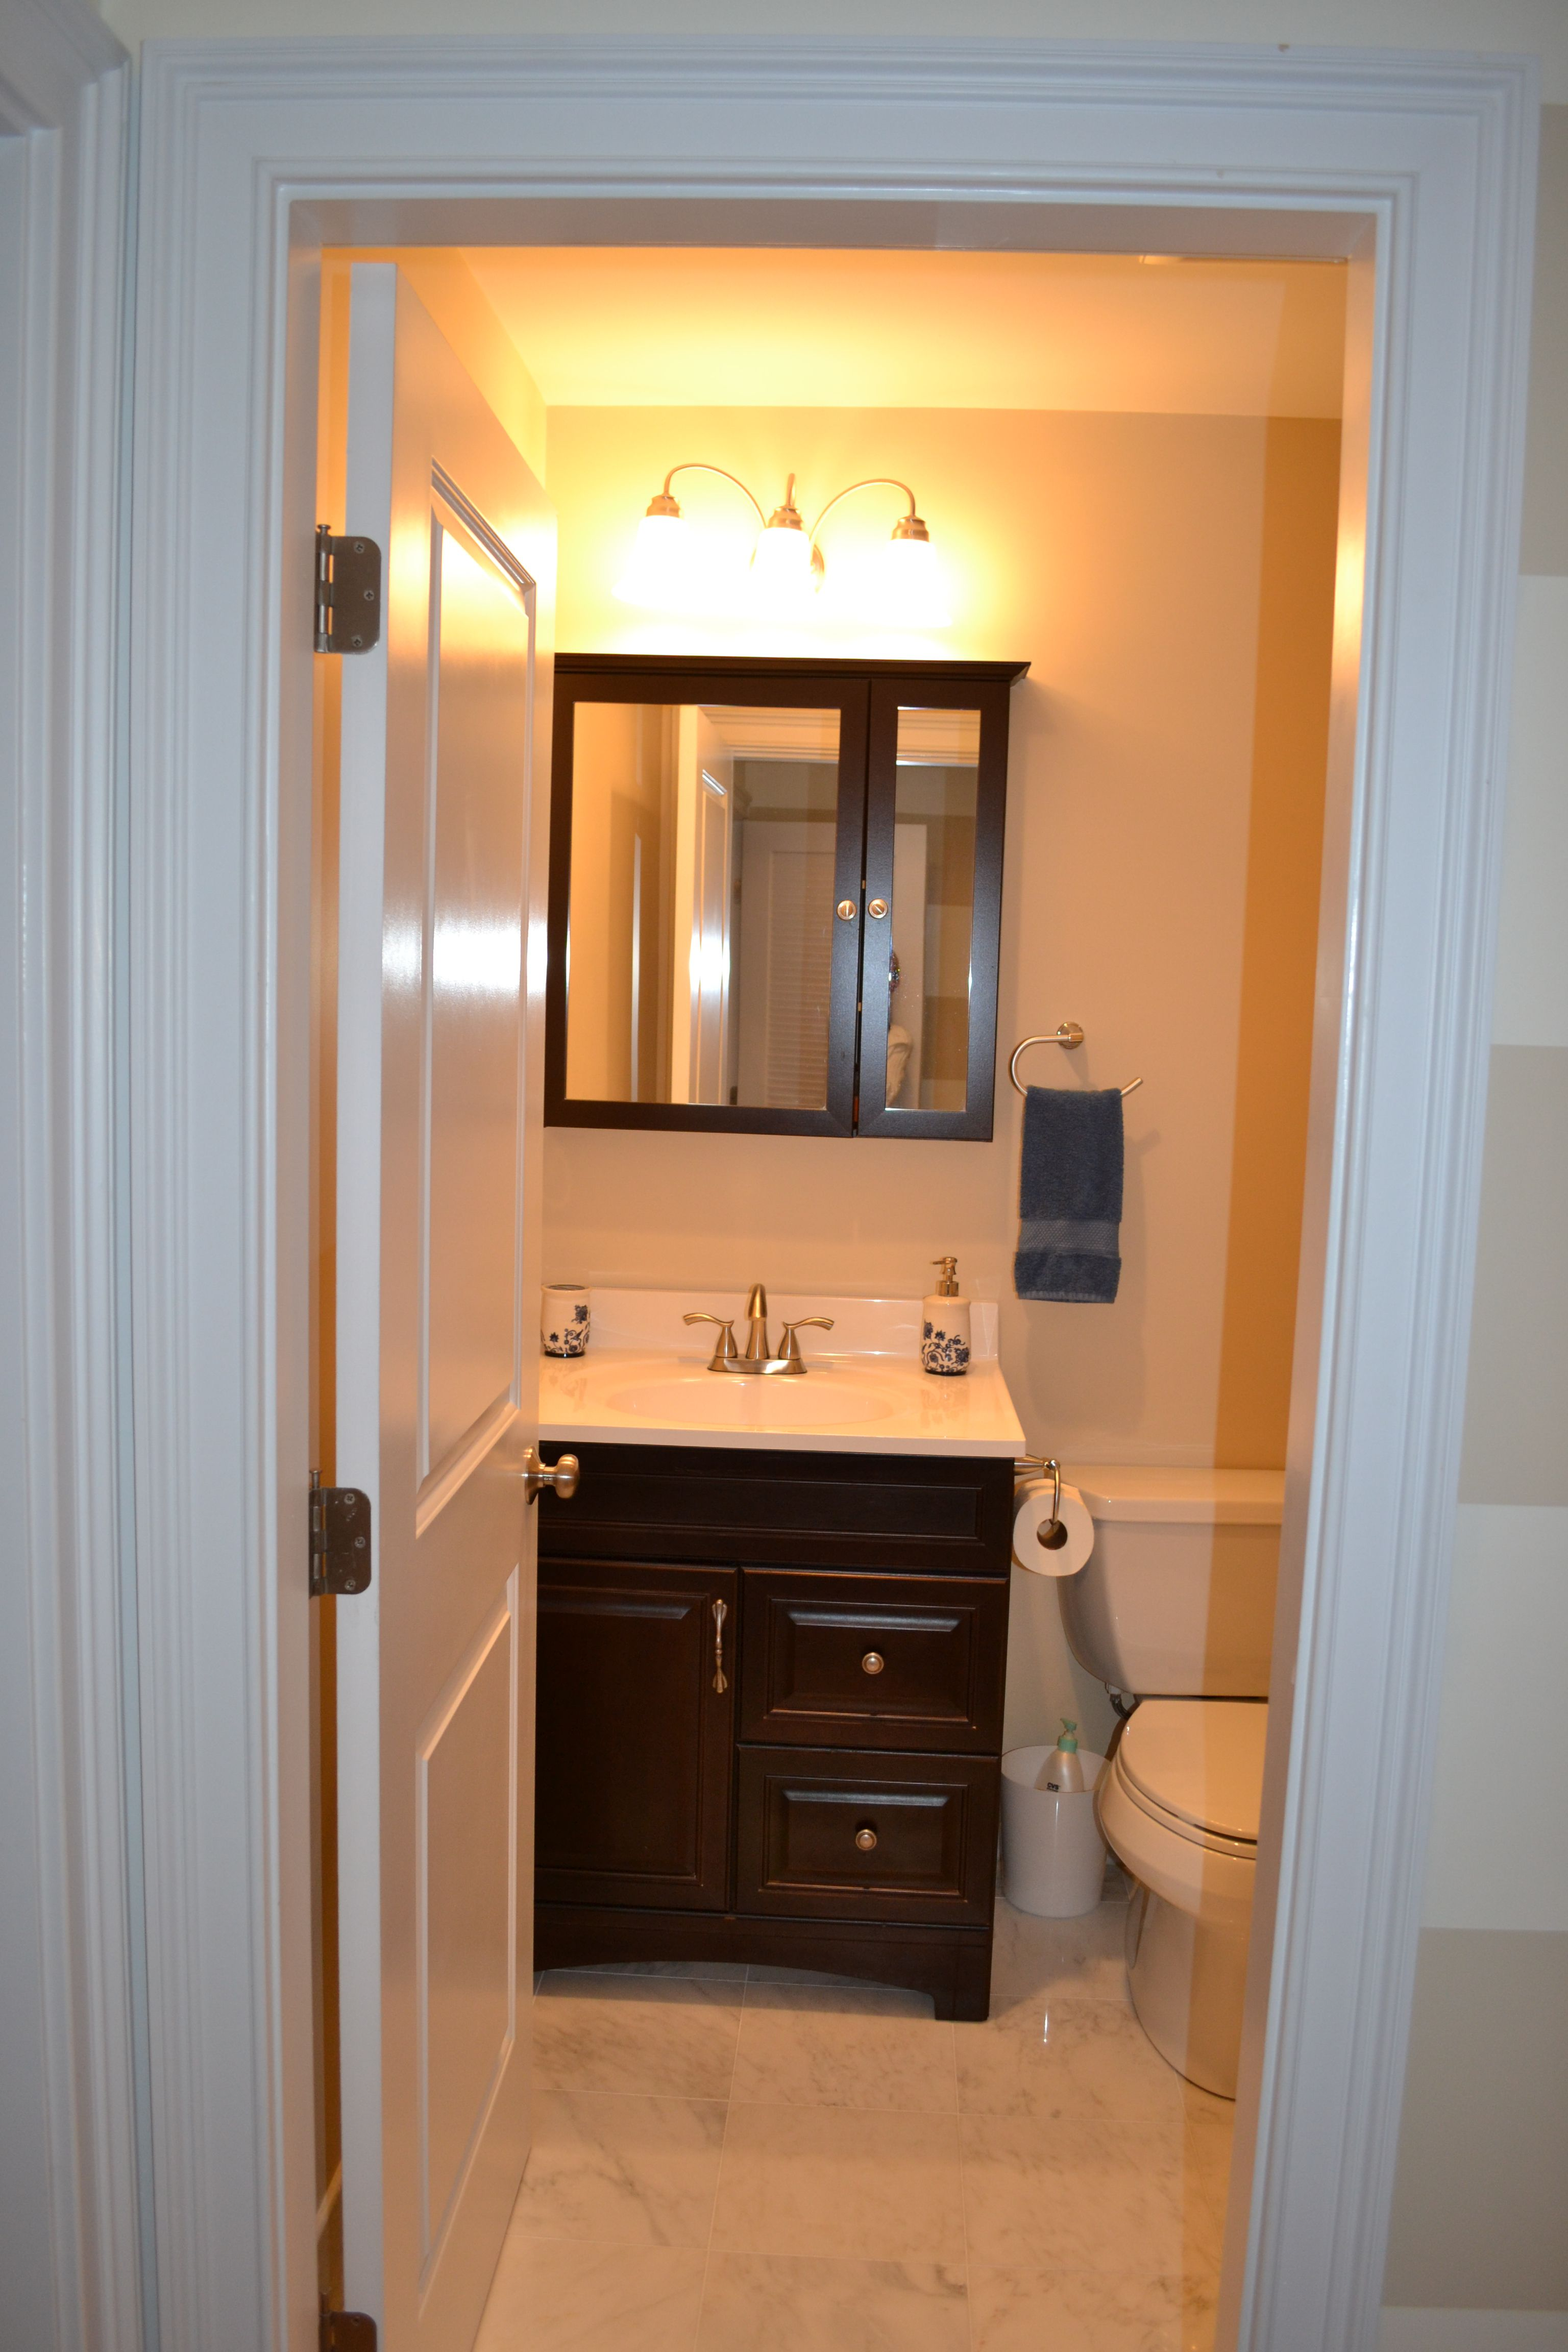 Minimalist Bathroom Small Guest Bathroom Design Ideas With Mirror As The Bathroom Storage Half Bathroom Decorating Ideas For Small Bathrooms With Good Color